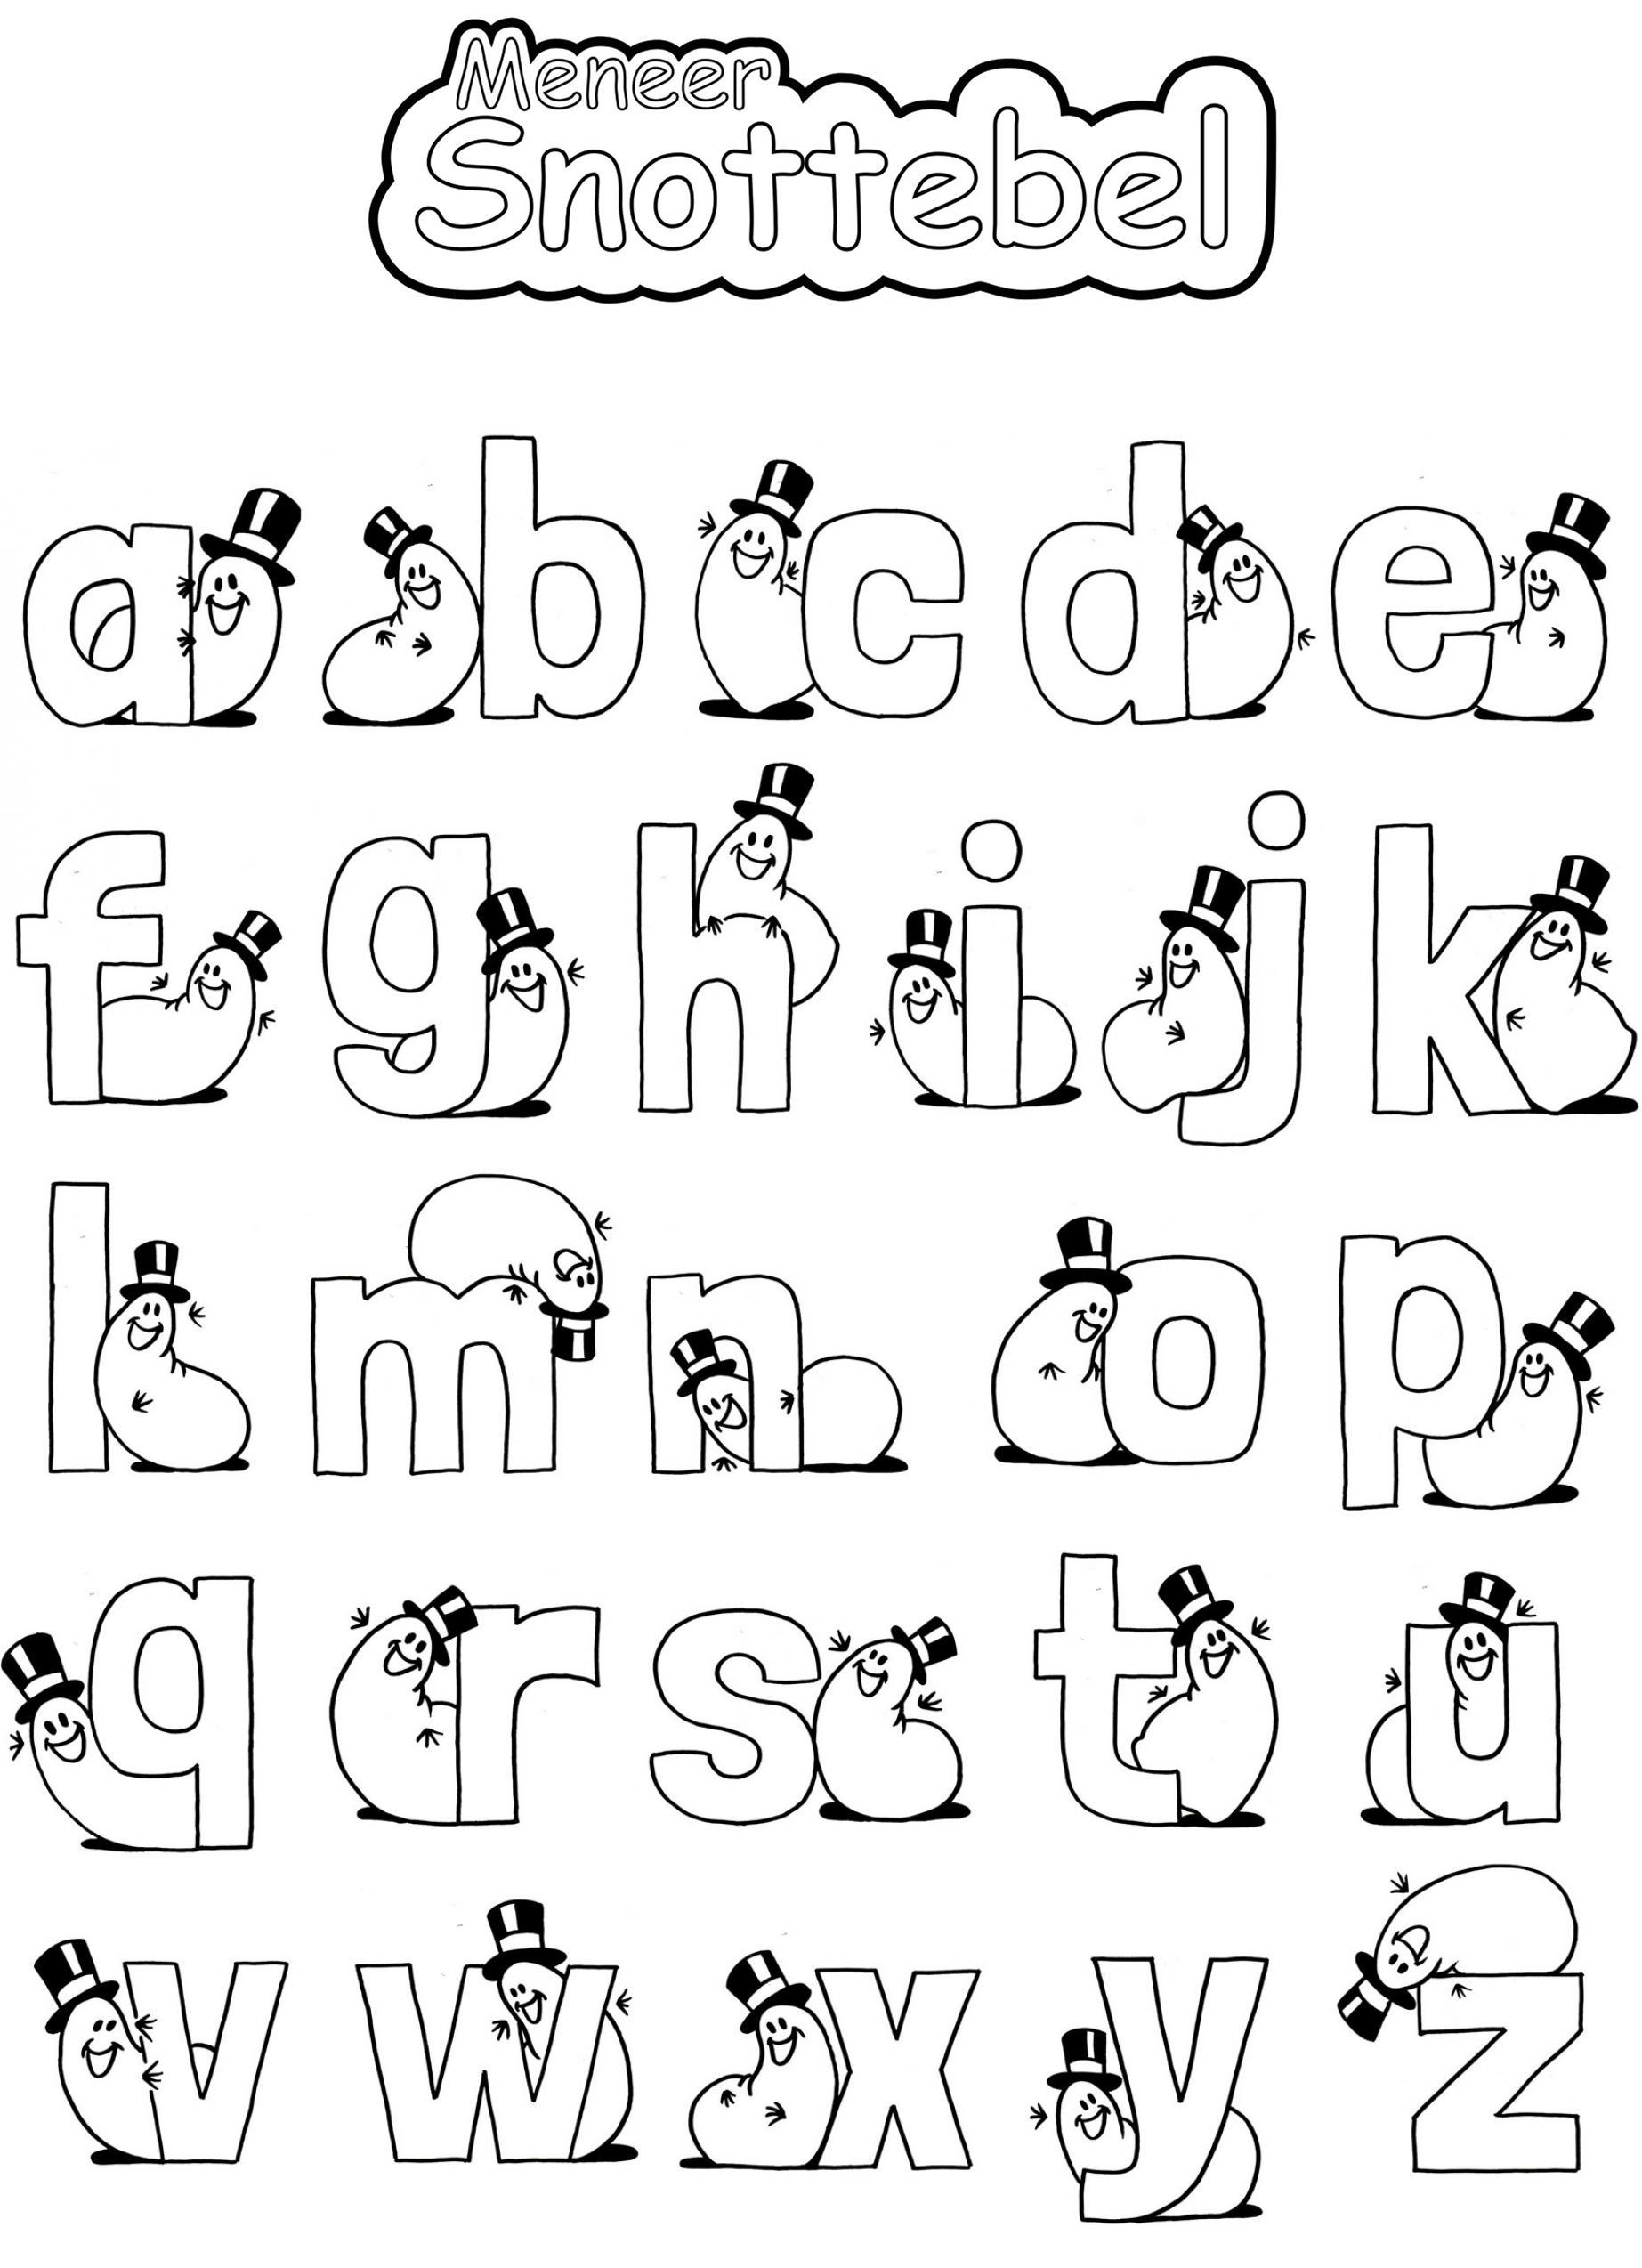 kleurplaat_alfabet-meneer-snottebel_meneersnottebel.jpg